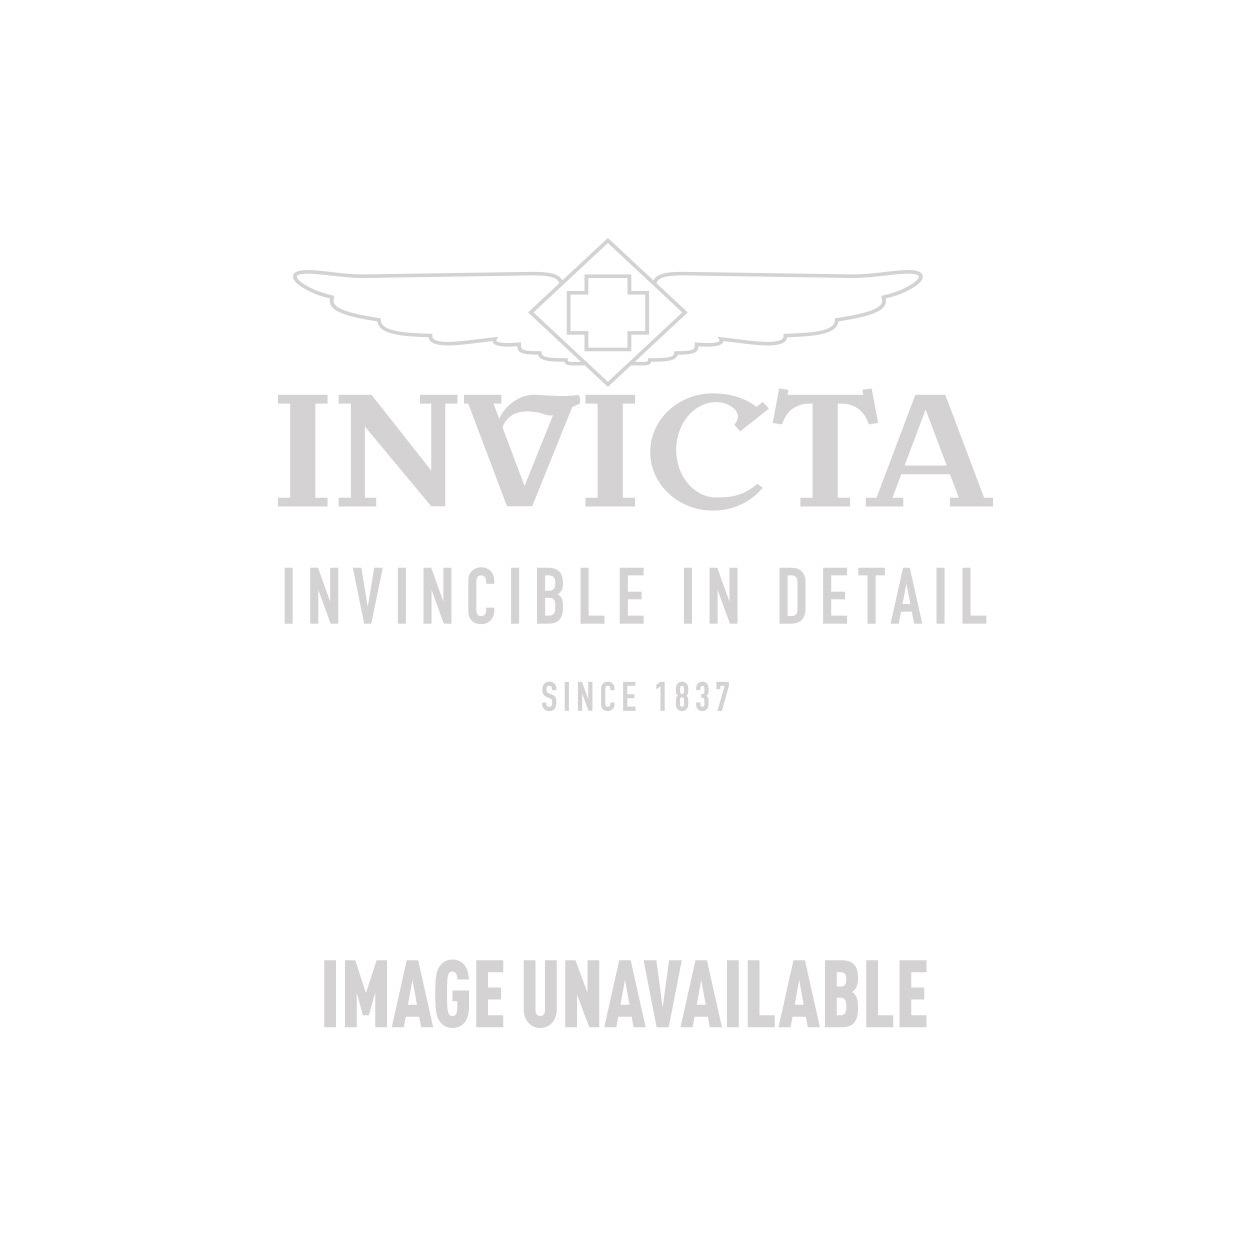 Invicta Sea Hunter Swiss Made Quartz Watch - Rose Gold case with Black tone Polyurethane band - Model 1546